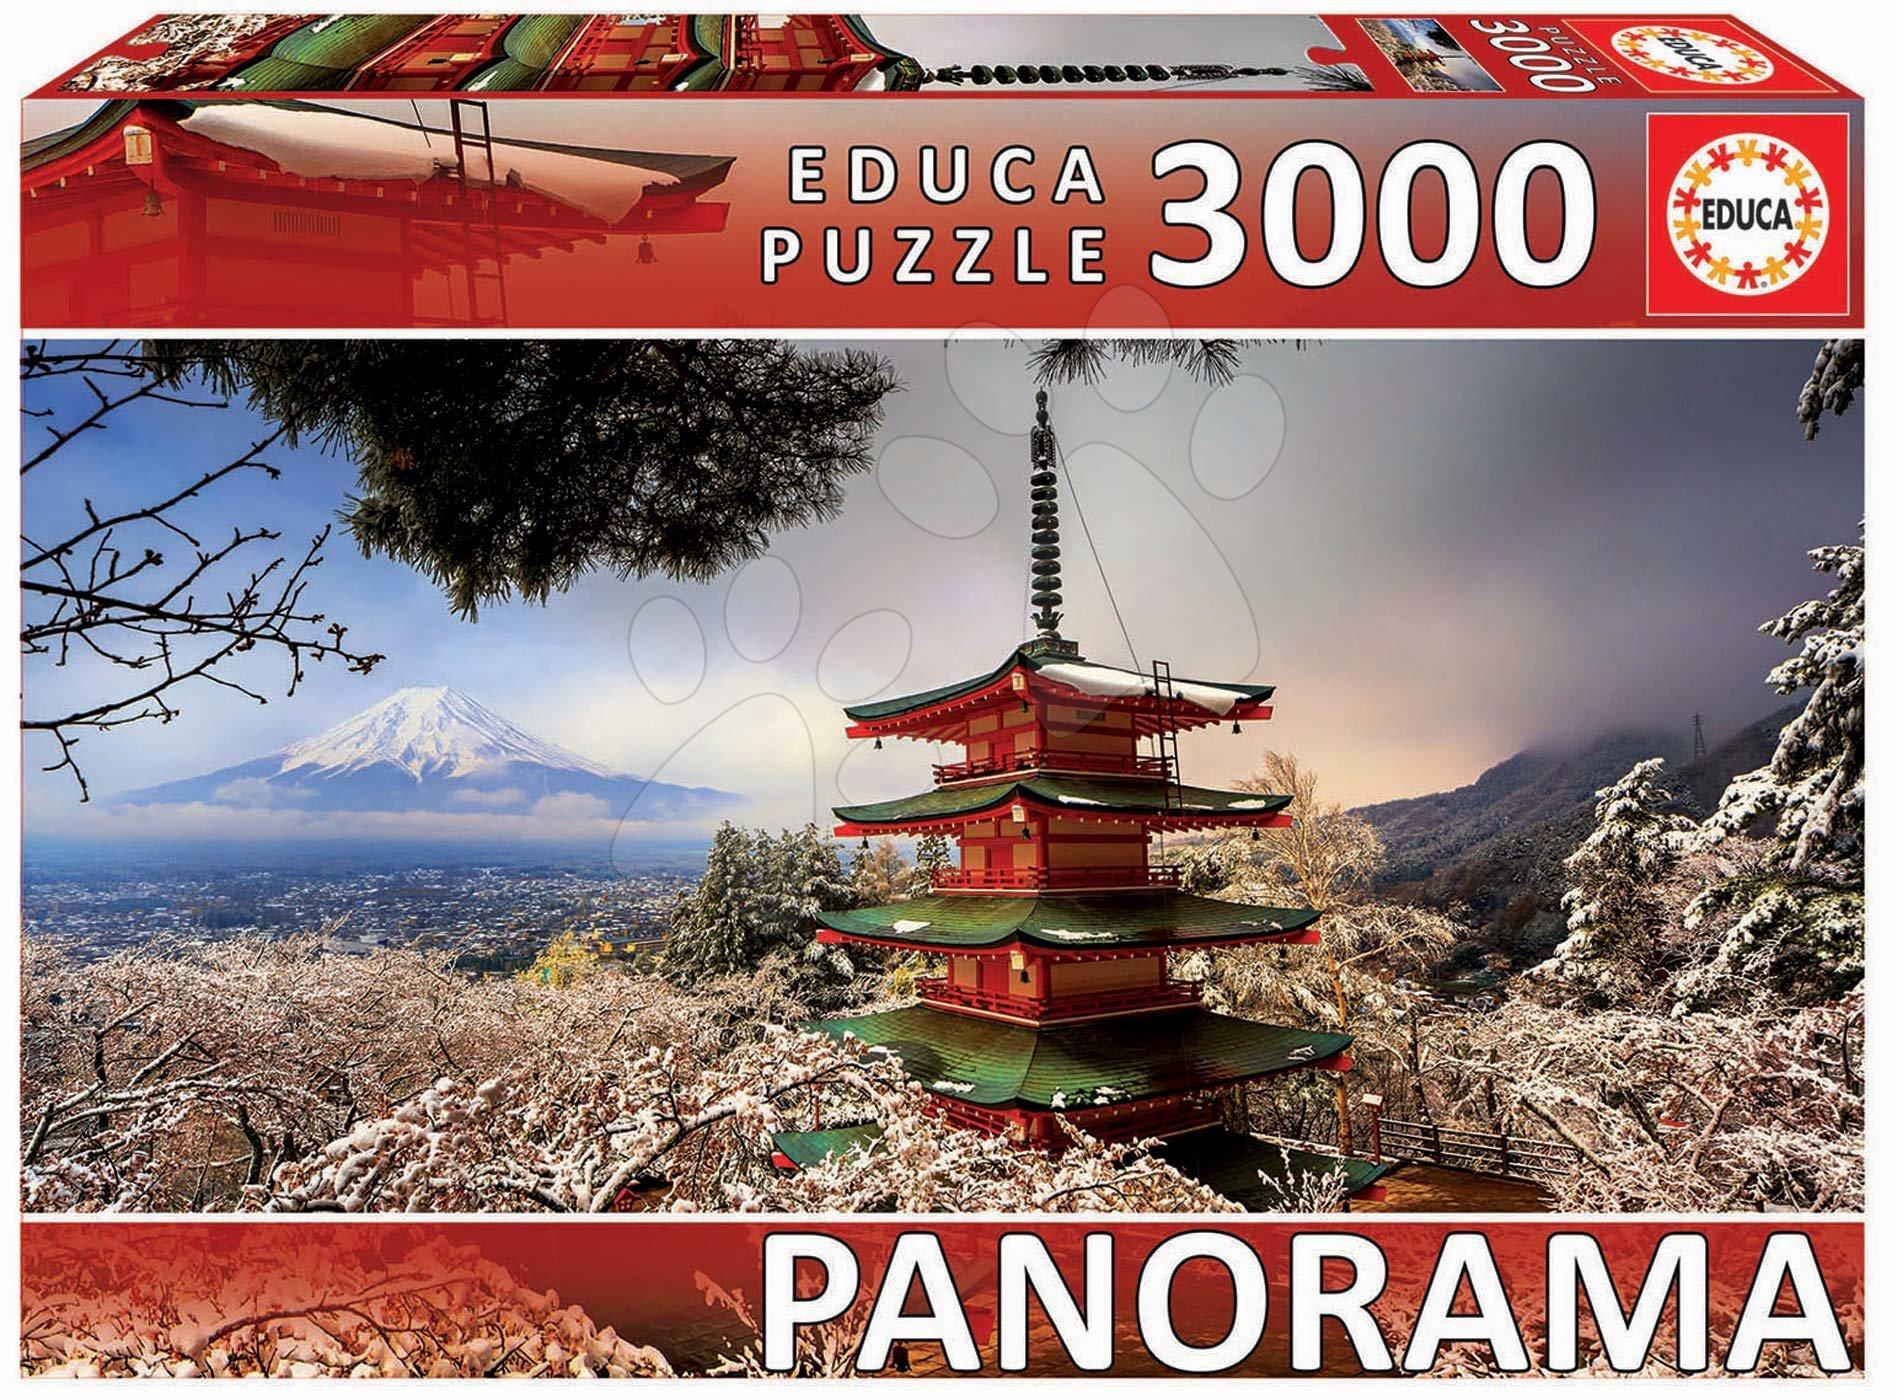 Puzzle panorama Mount Fuji and Chureito Pagoda Educa 3000 dielov EDU18013